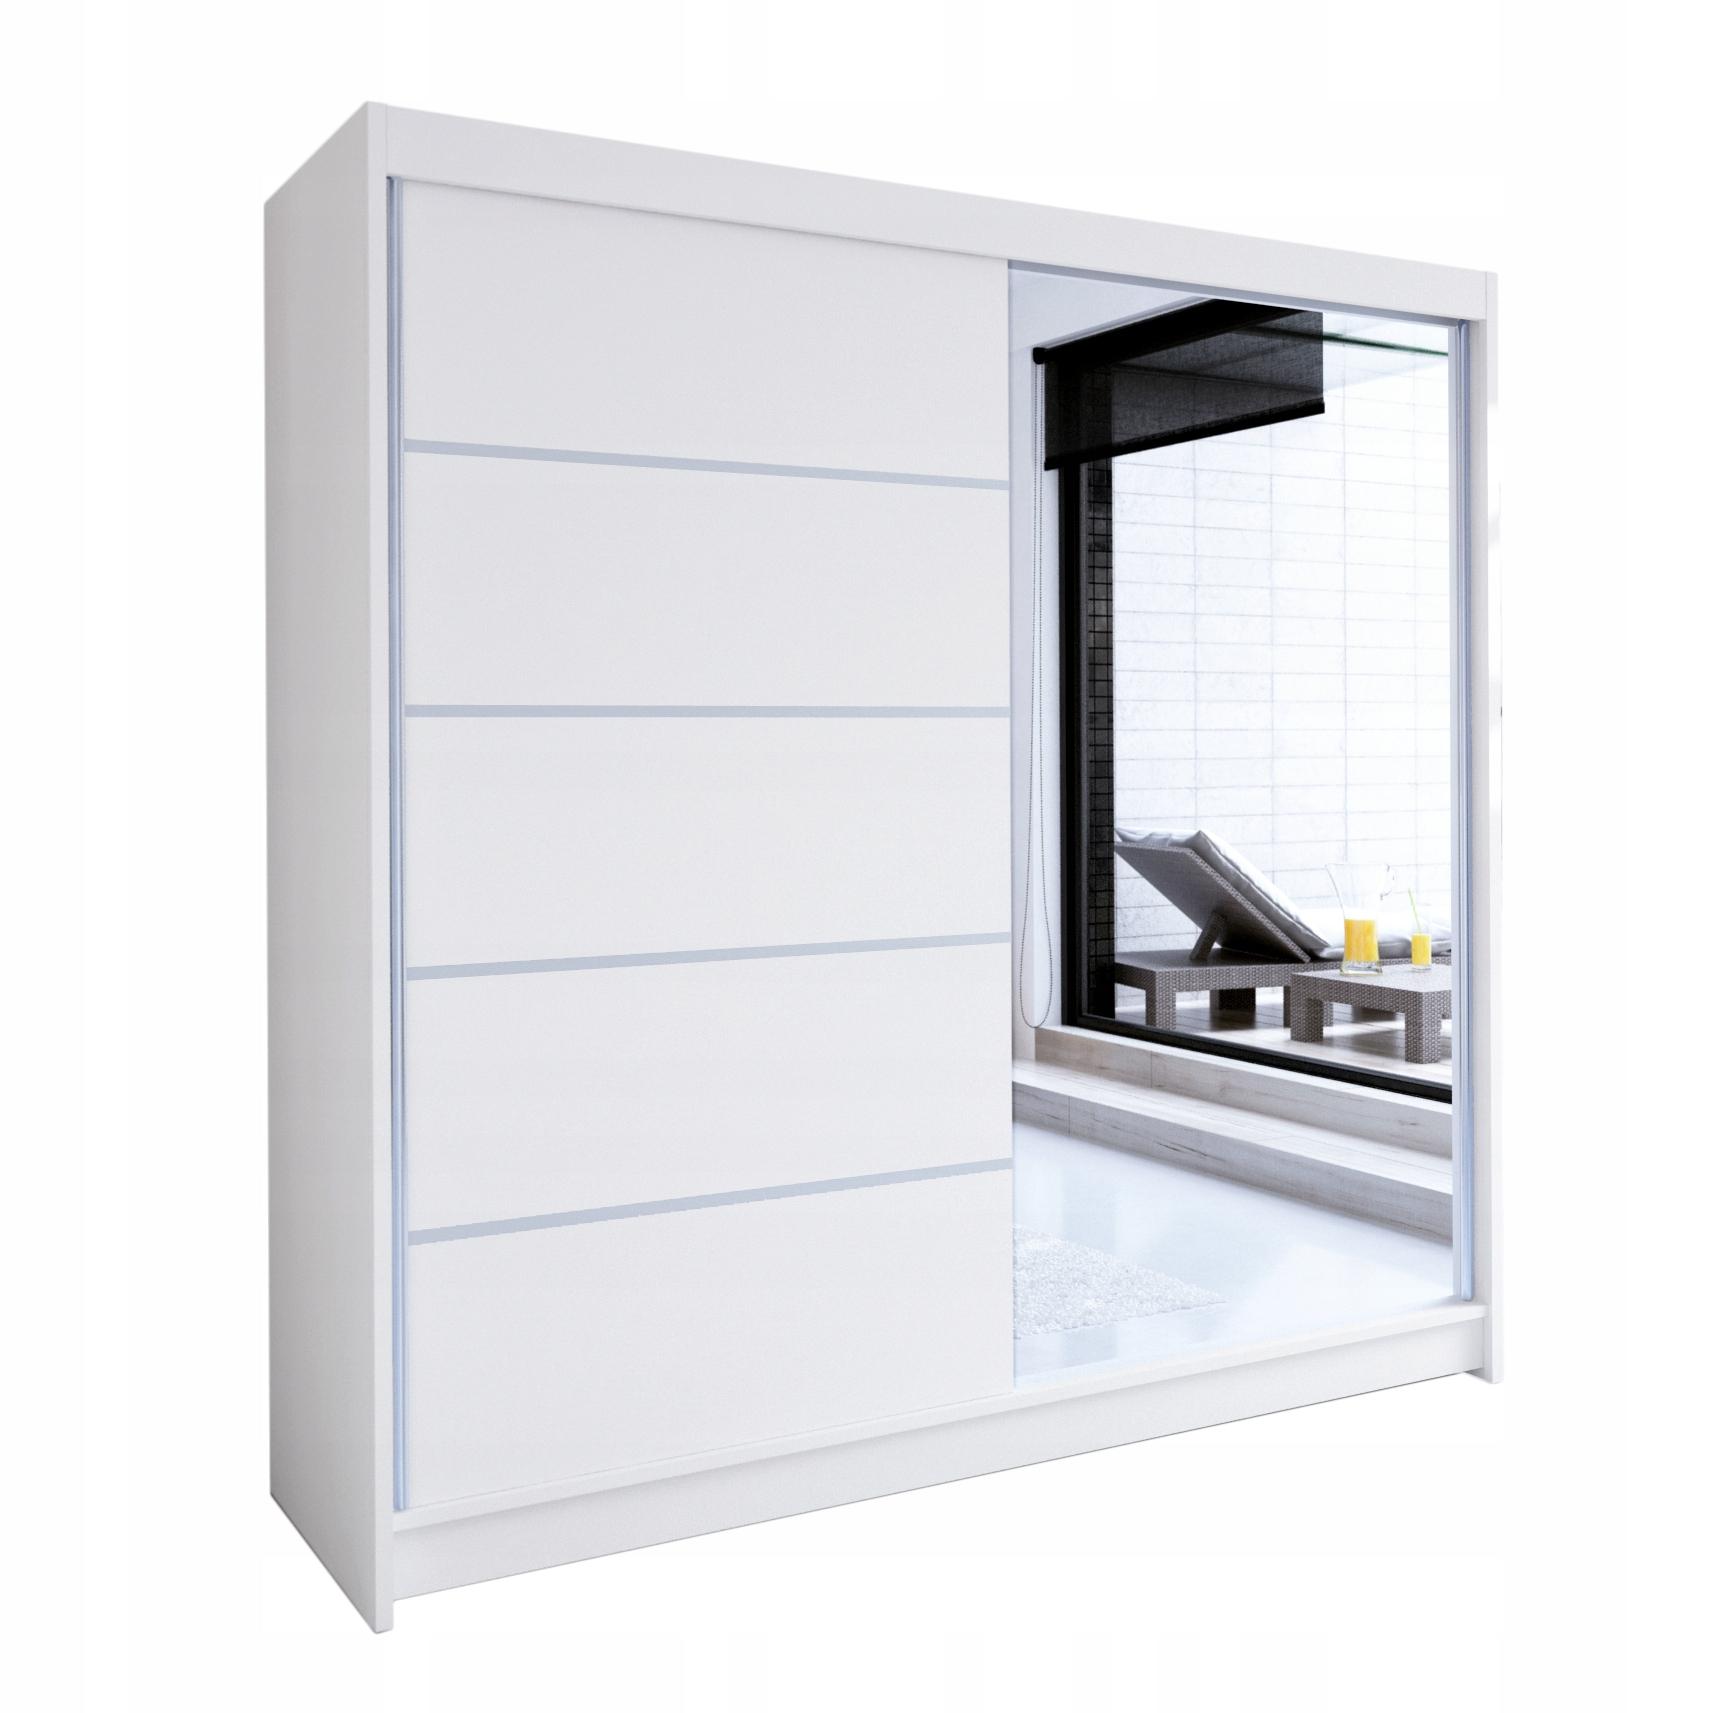 шкаф с дверью раздвижными ТАЛИНЕ III 180 зеркало